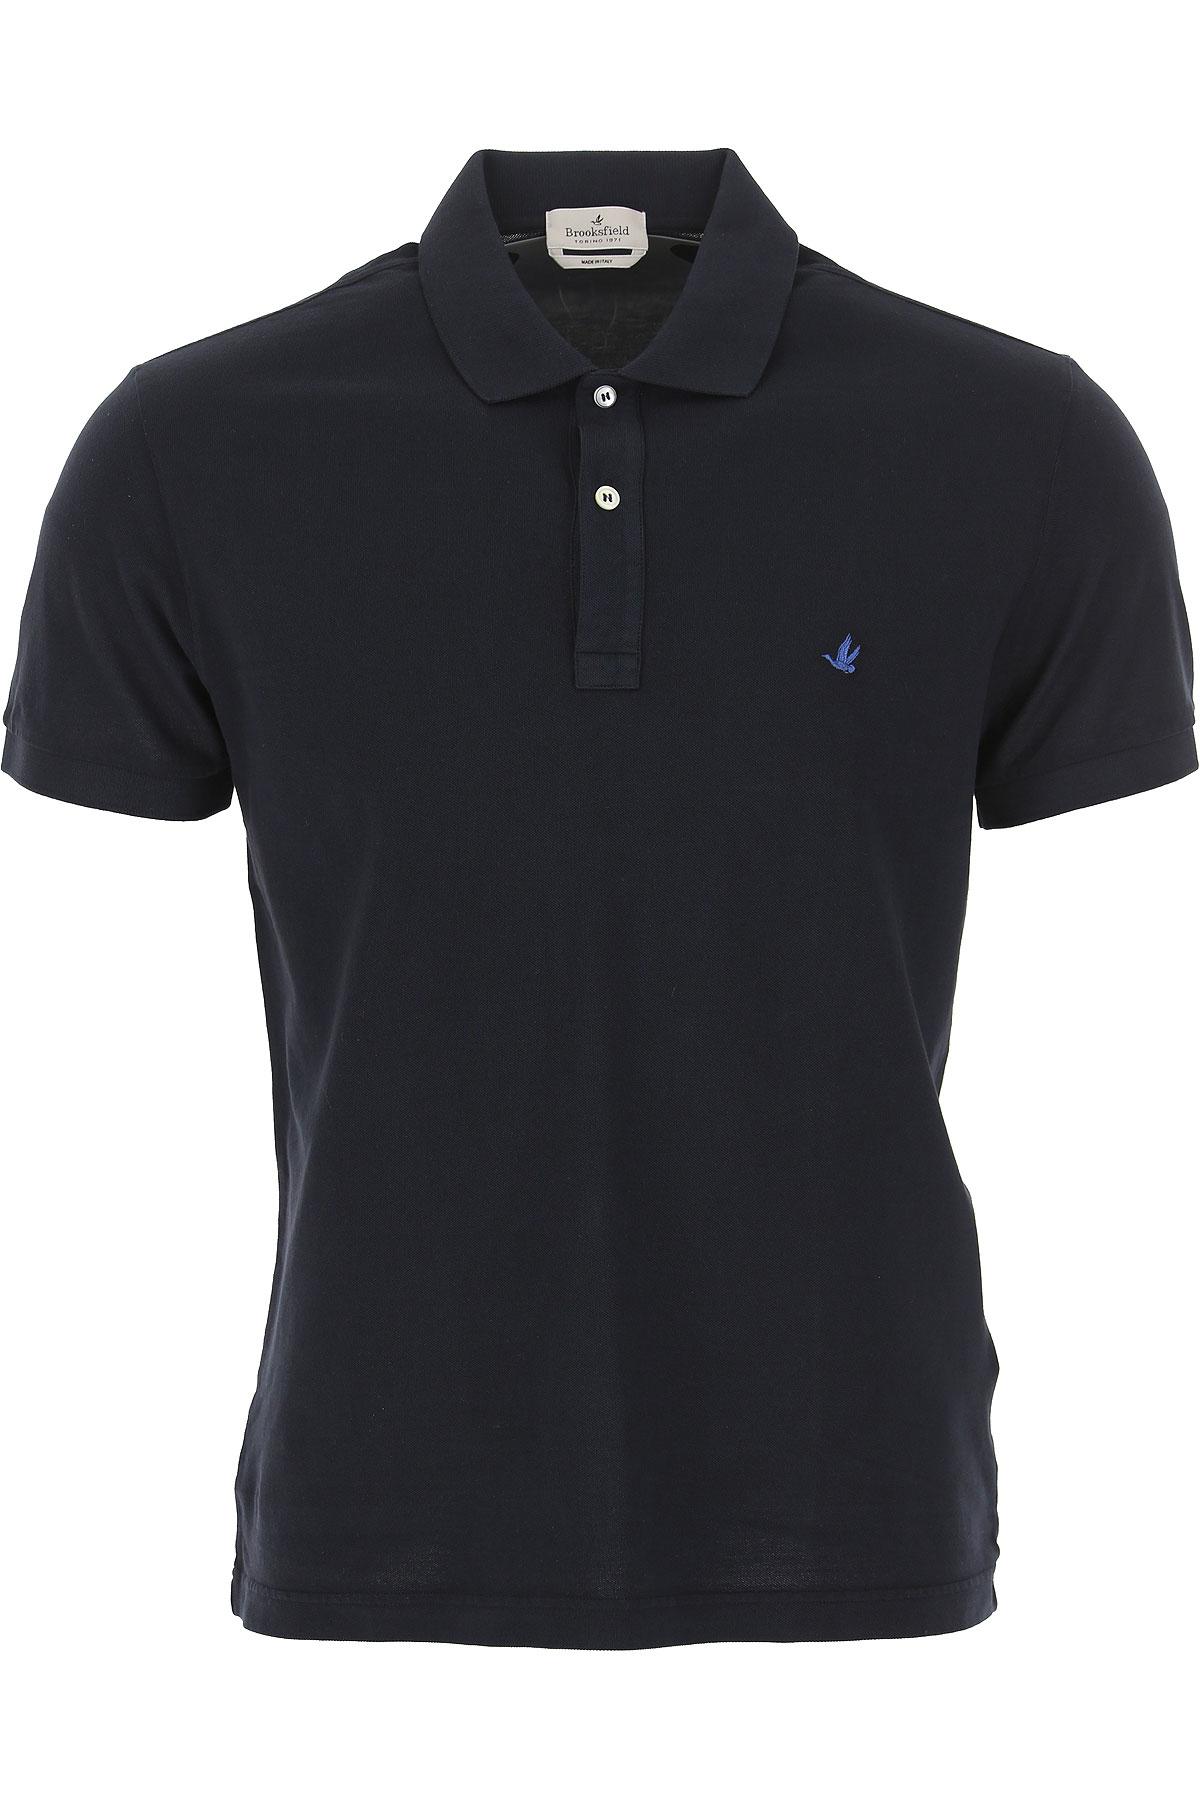 Brooksfield Polo Shirt for Men On Sale, Navy Blue, Cotton, 2019, L XL